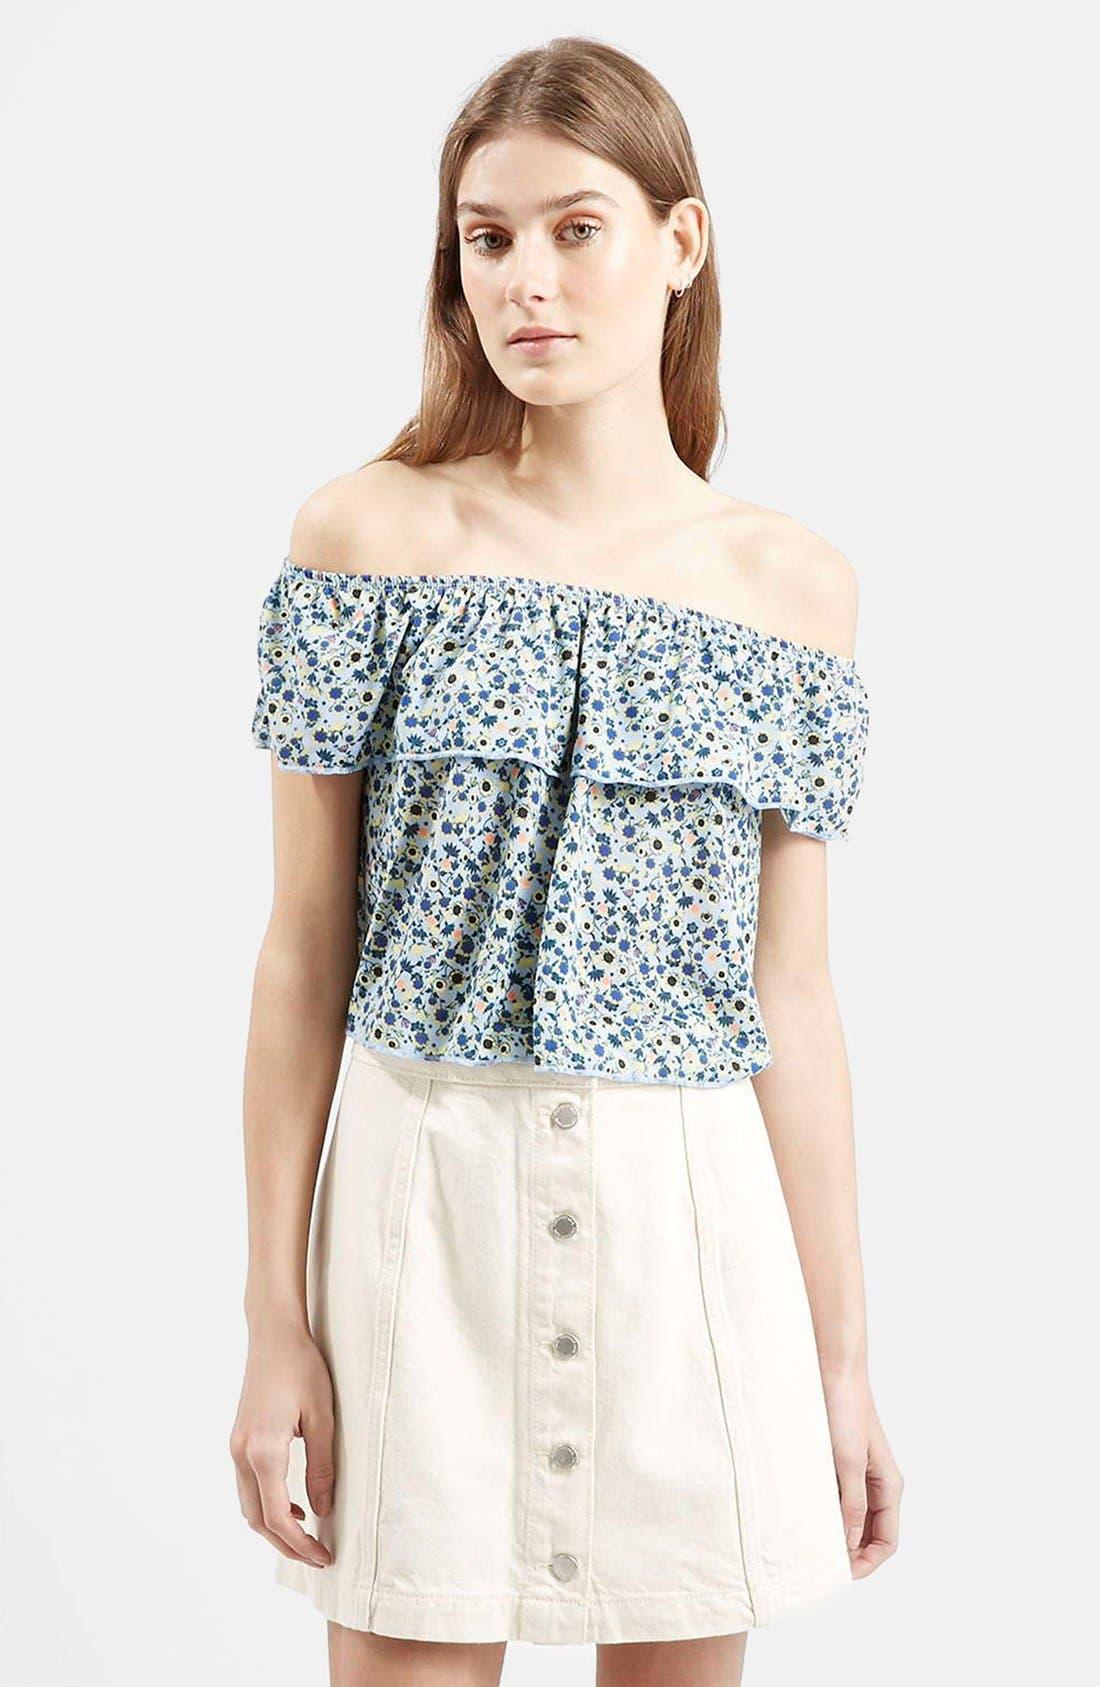 Main Image - Topshop Floral Print Off the Shoulder Top